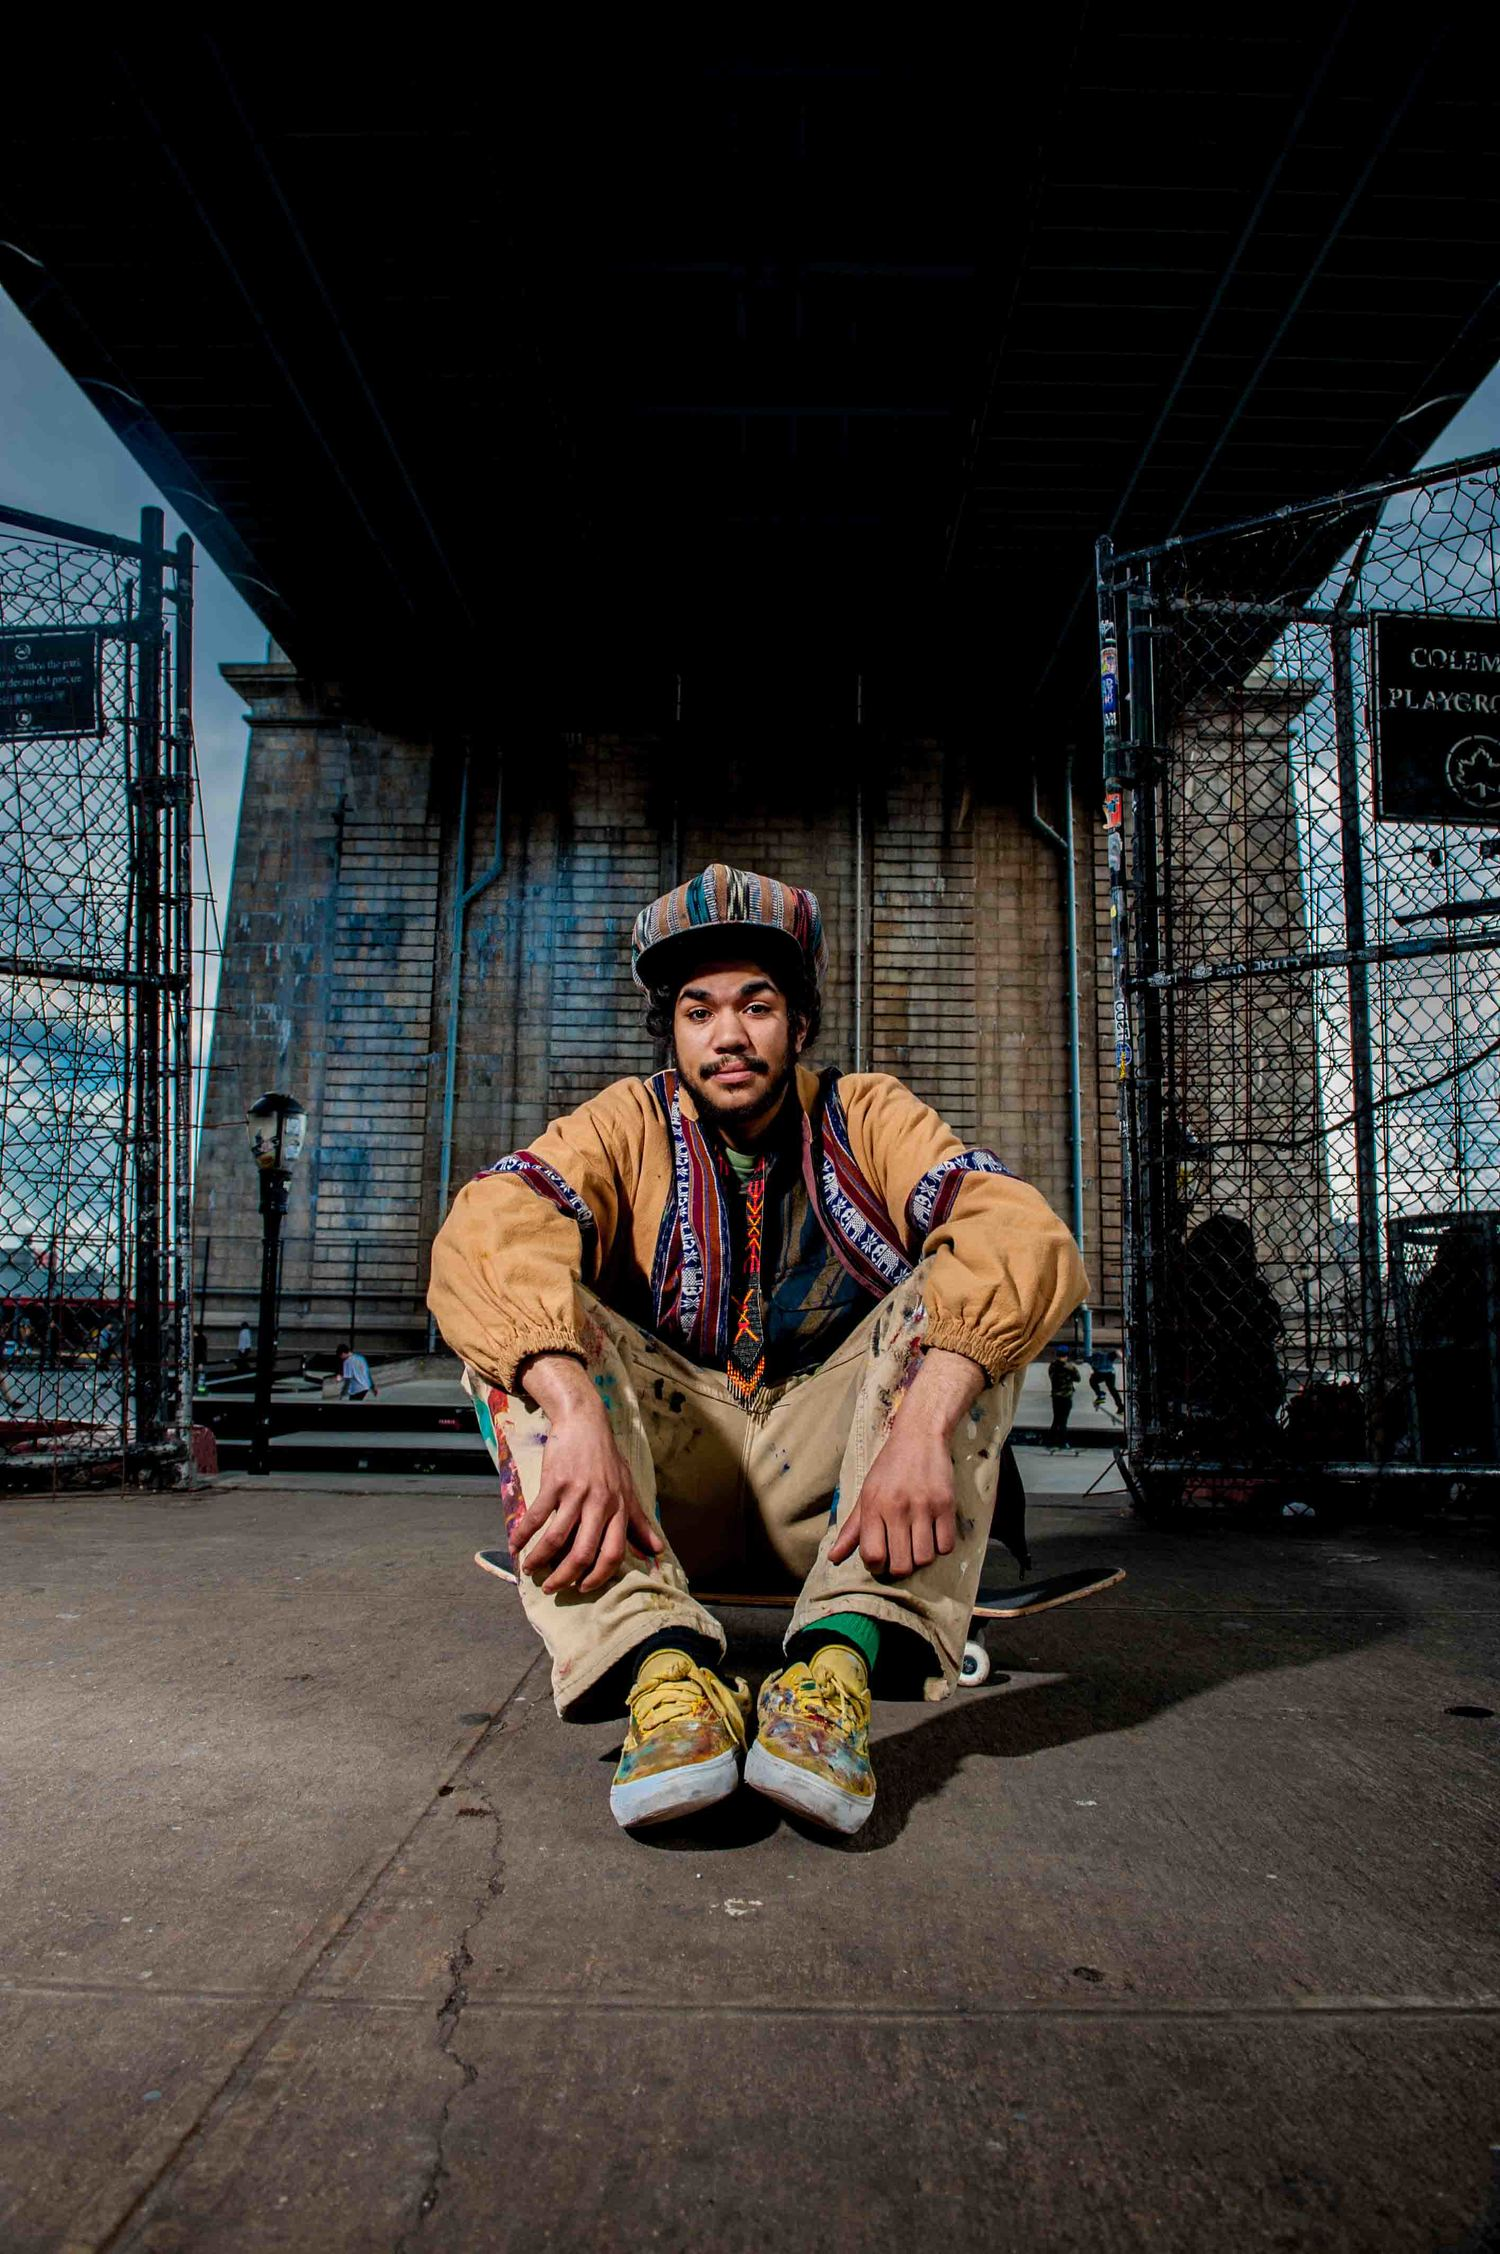 jonathan-mcphail-photography-brooklyn-new-york-nyc-portraits-headshots-musicians-artists-2134.jpg